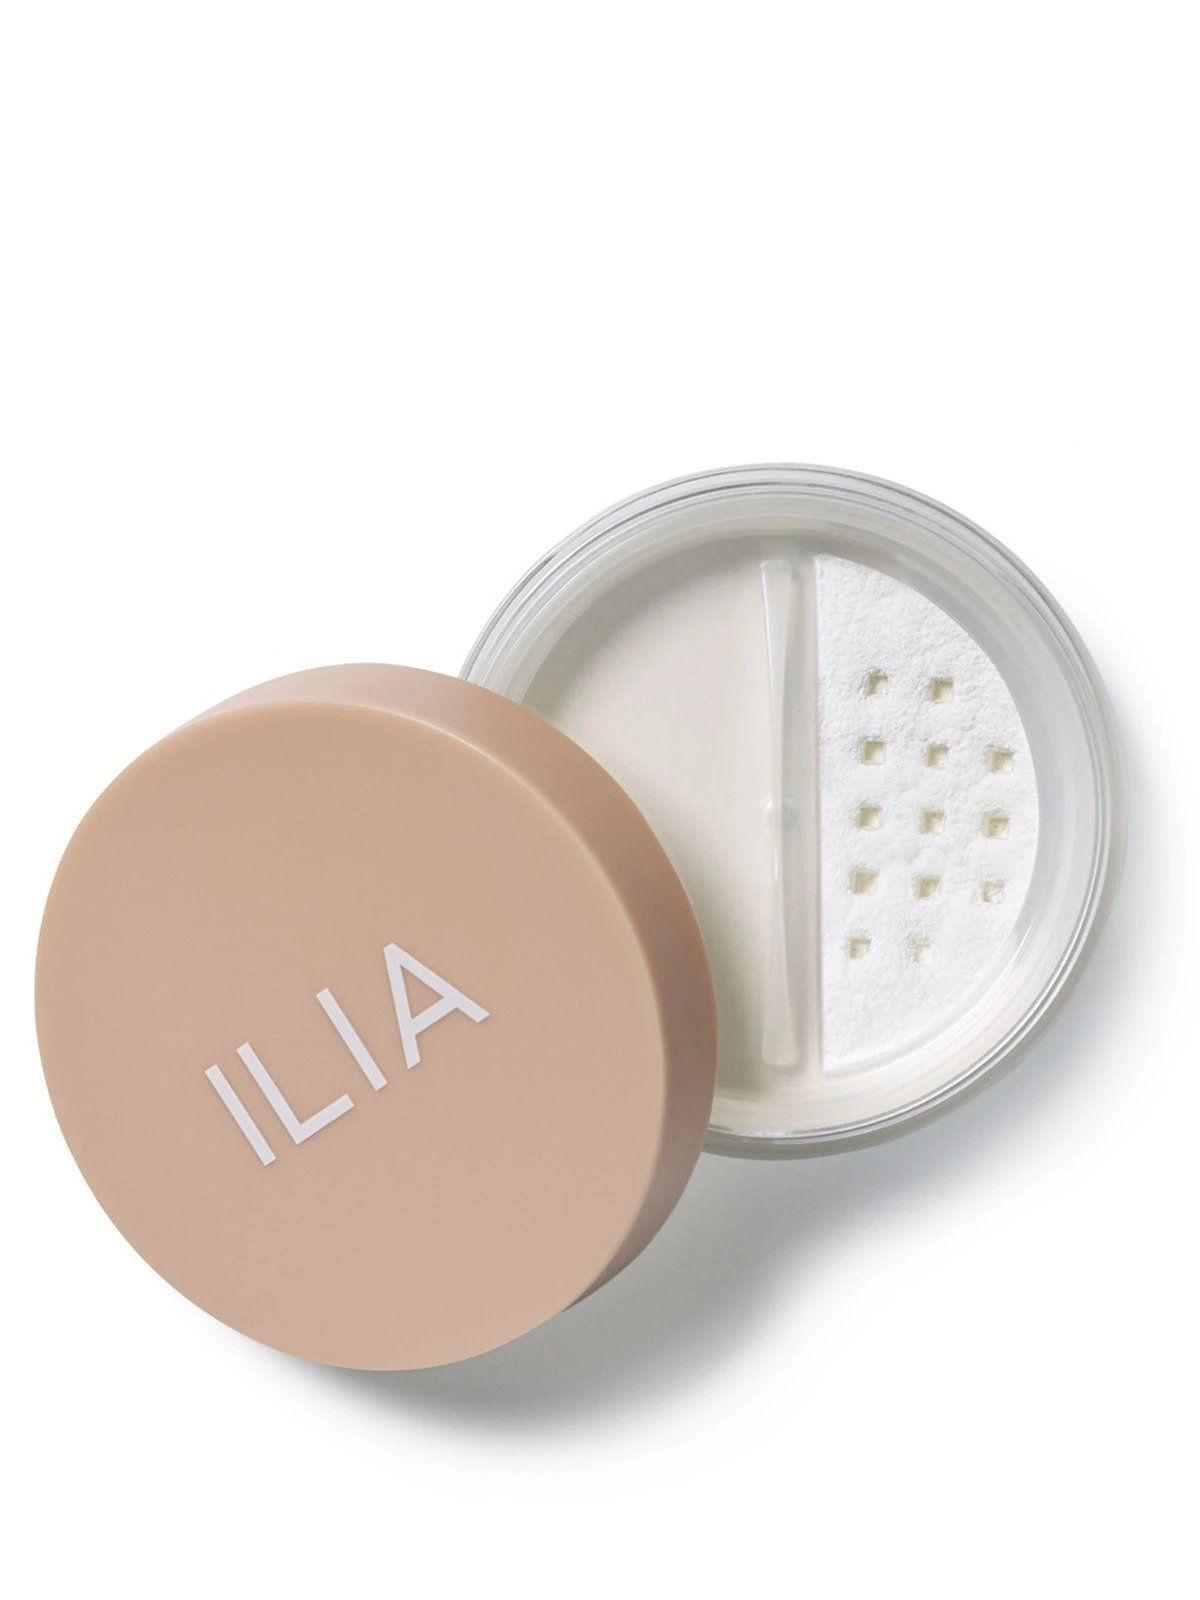 Ilia Soft Focus Powder